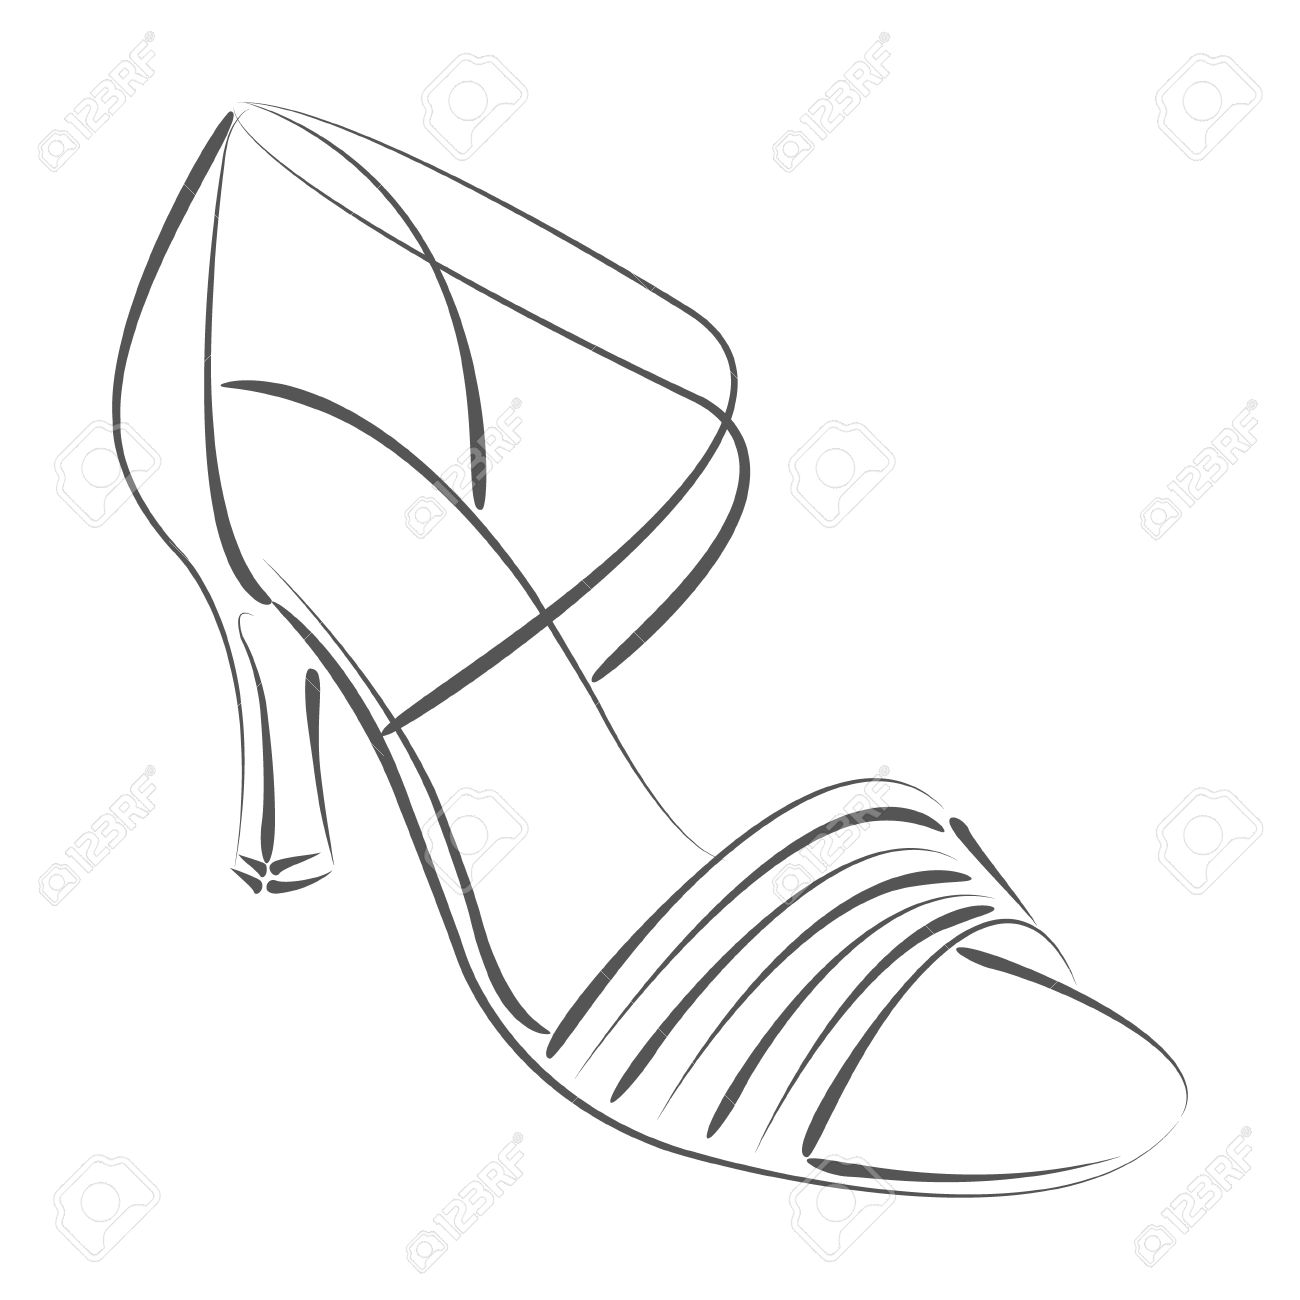 1300x1300 Elegant Sketched Woman's Shoe. Salsa Dance Shoes. Design Template